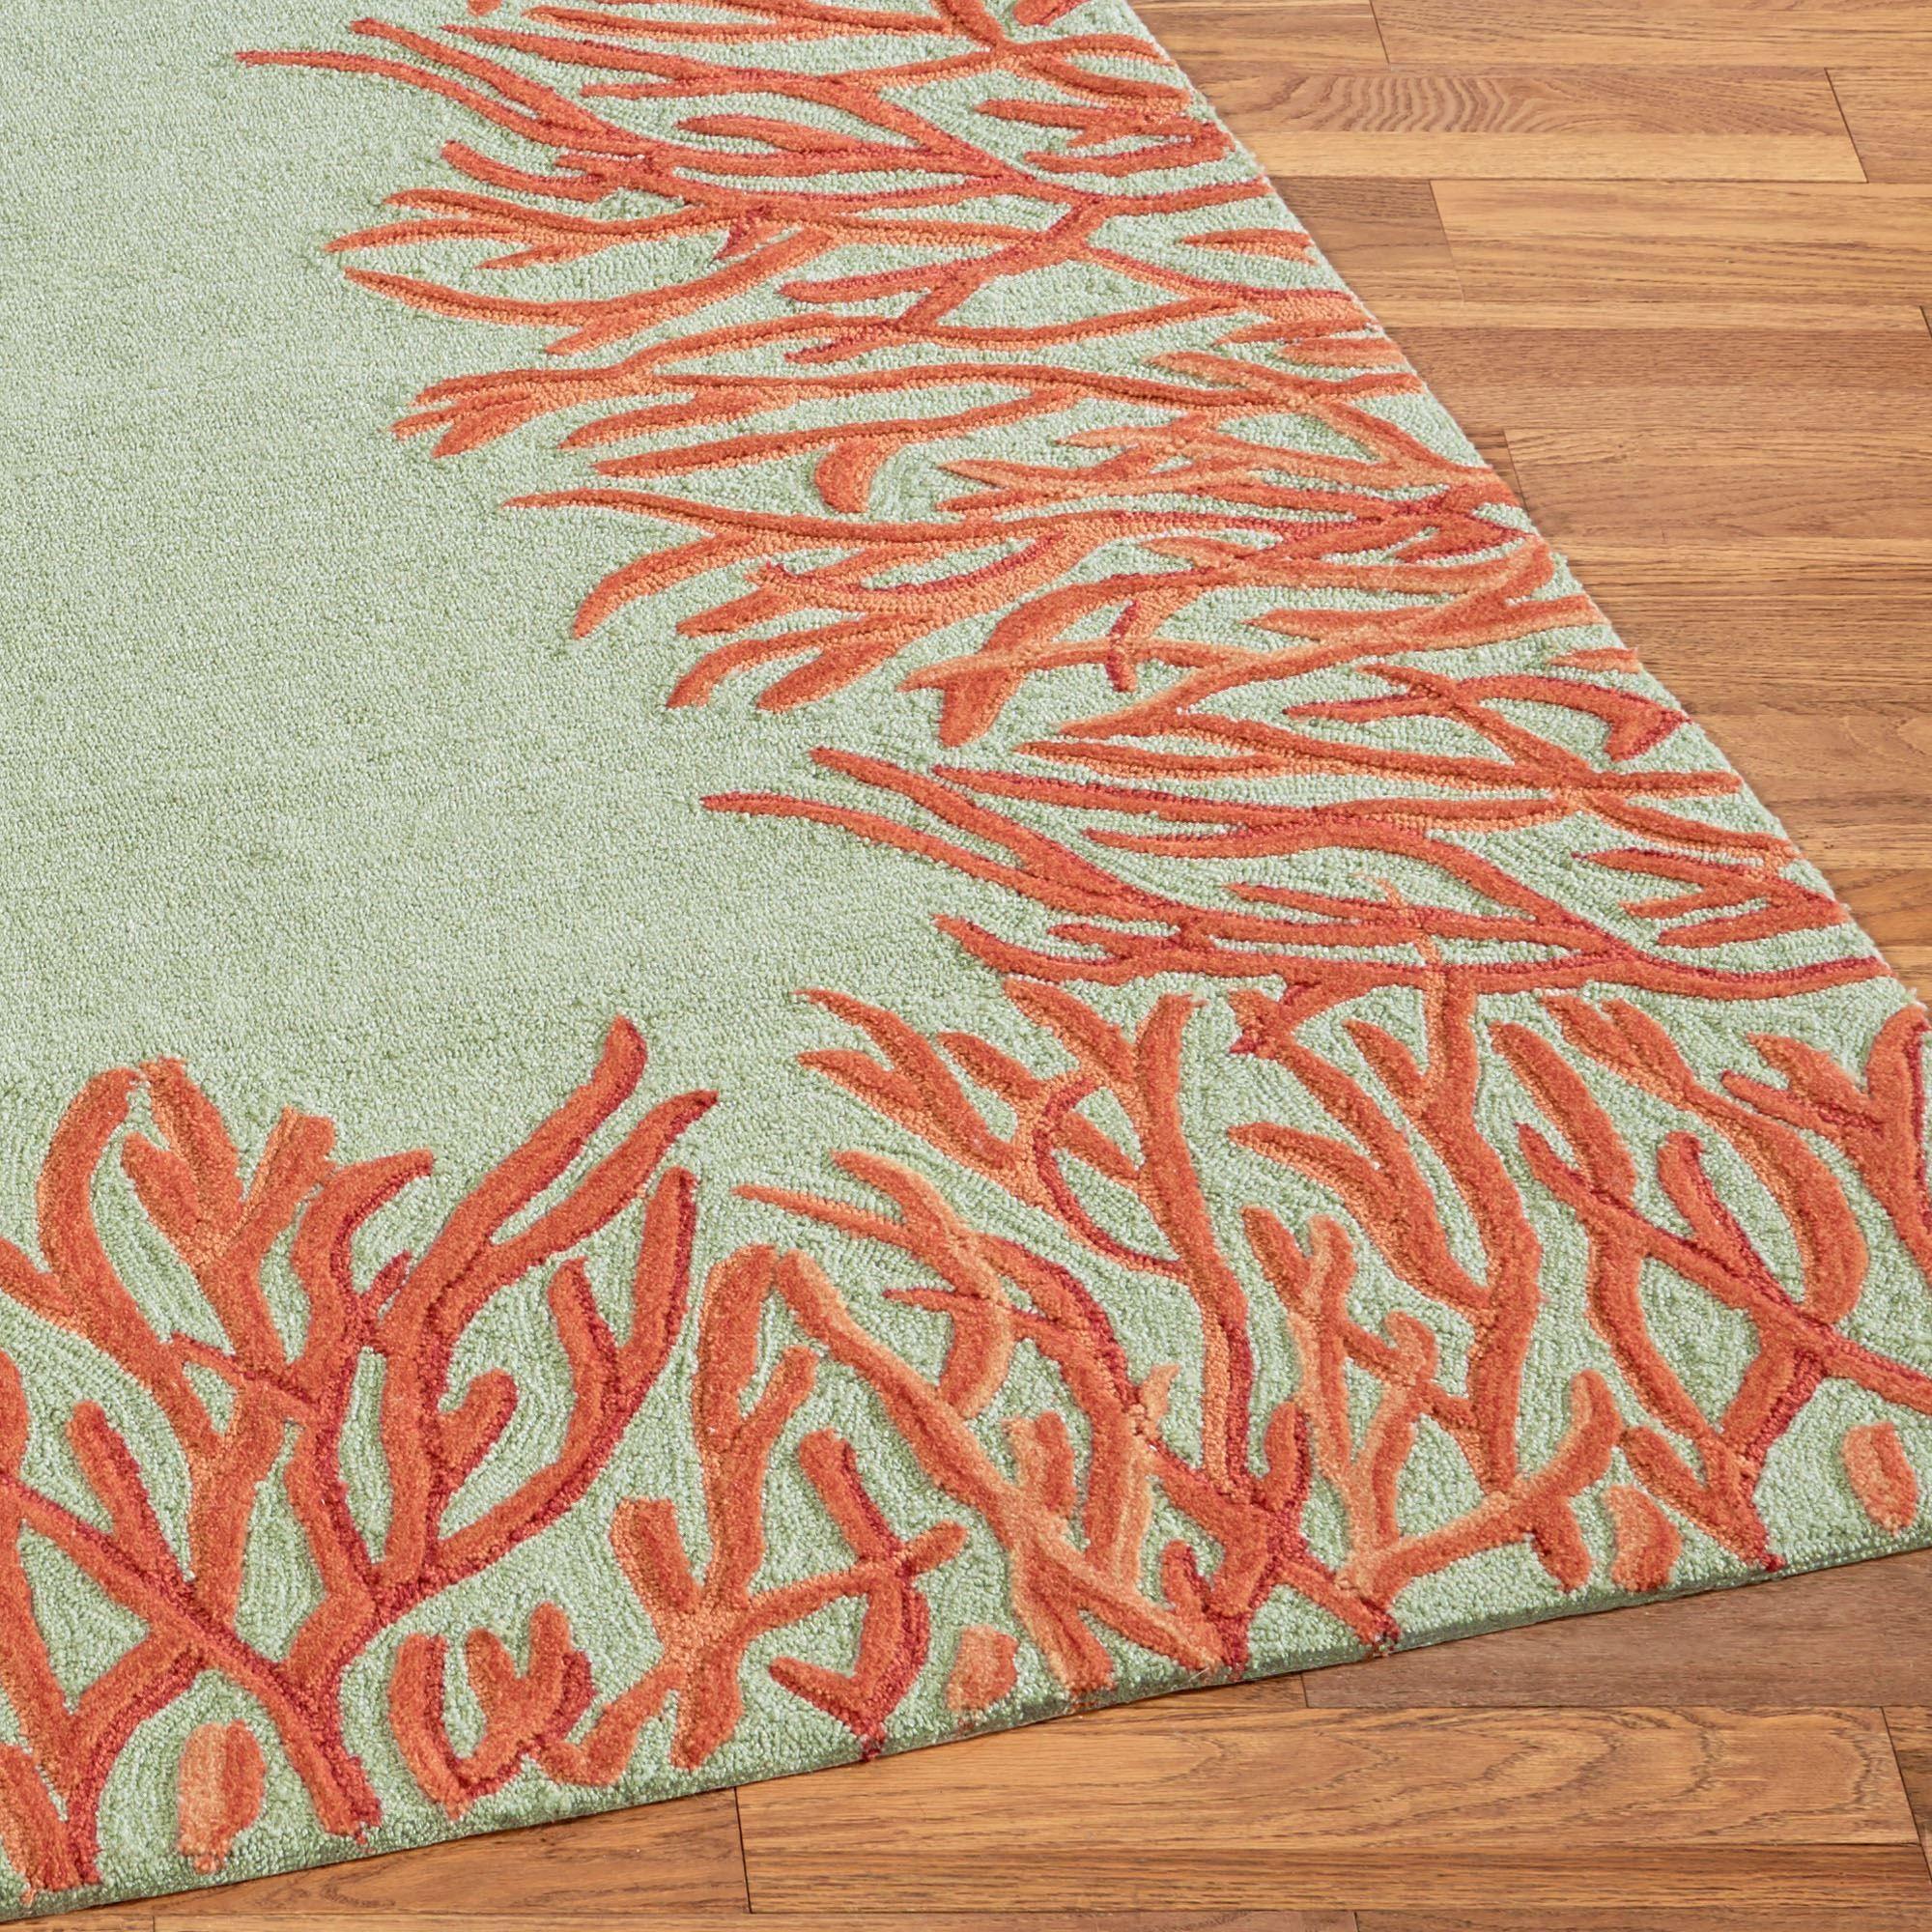 High Quality Coral Reef Rug Runner Orange 2 X 8 Home Design Ideas